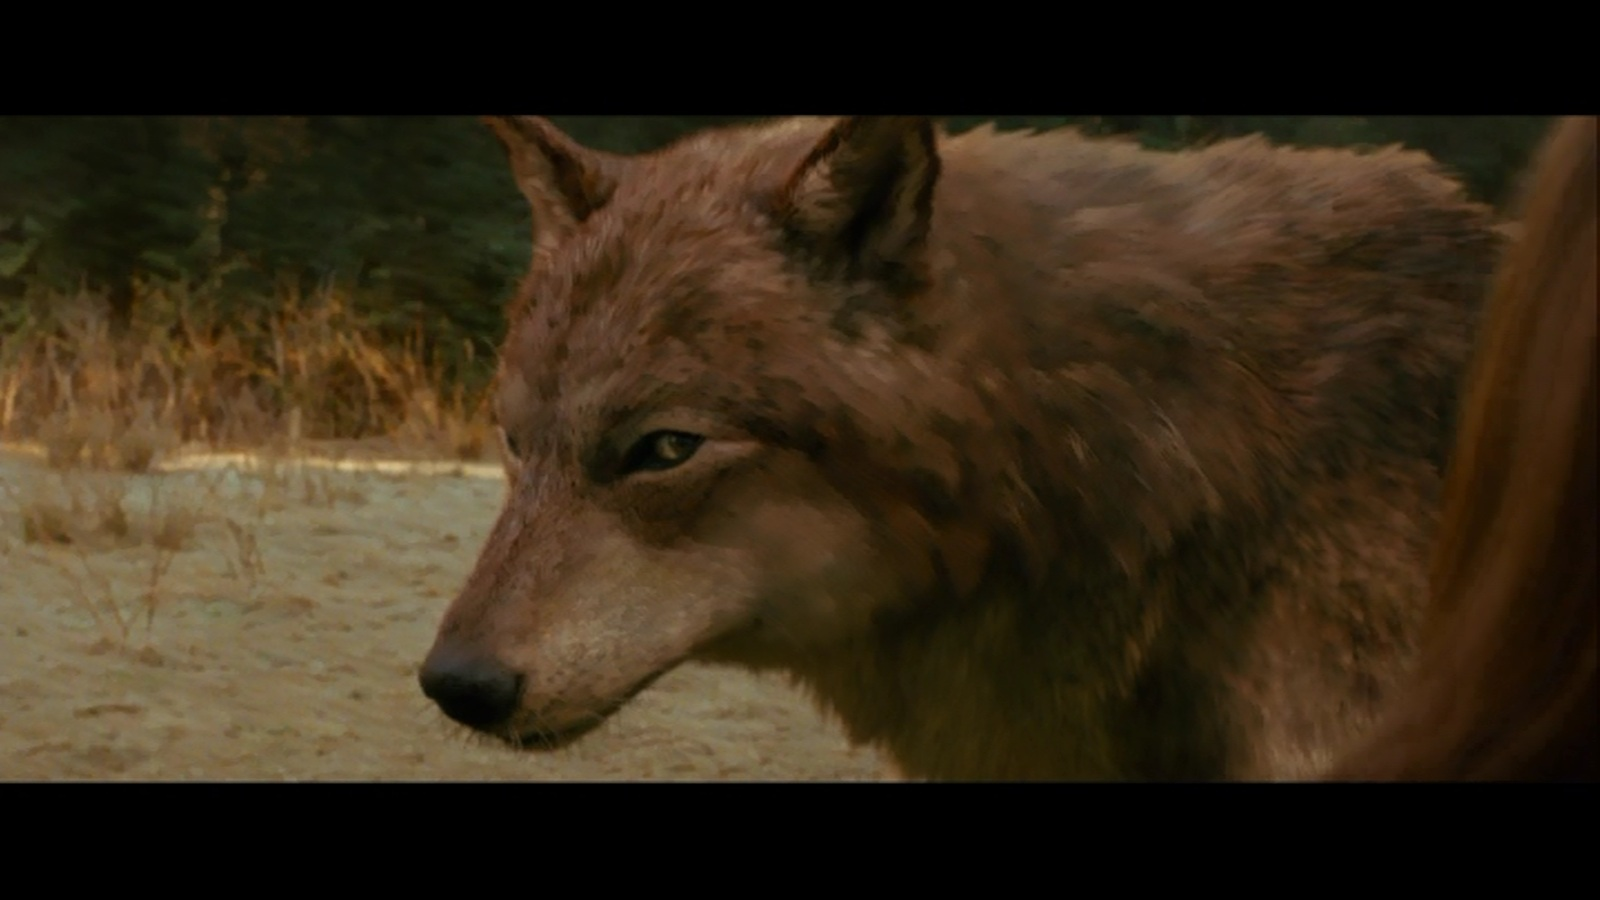 jacob black werewolf transformation - photo #21